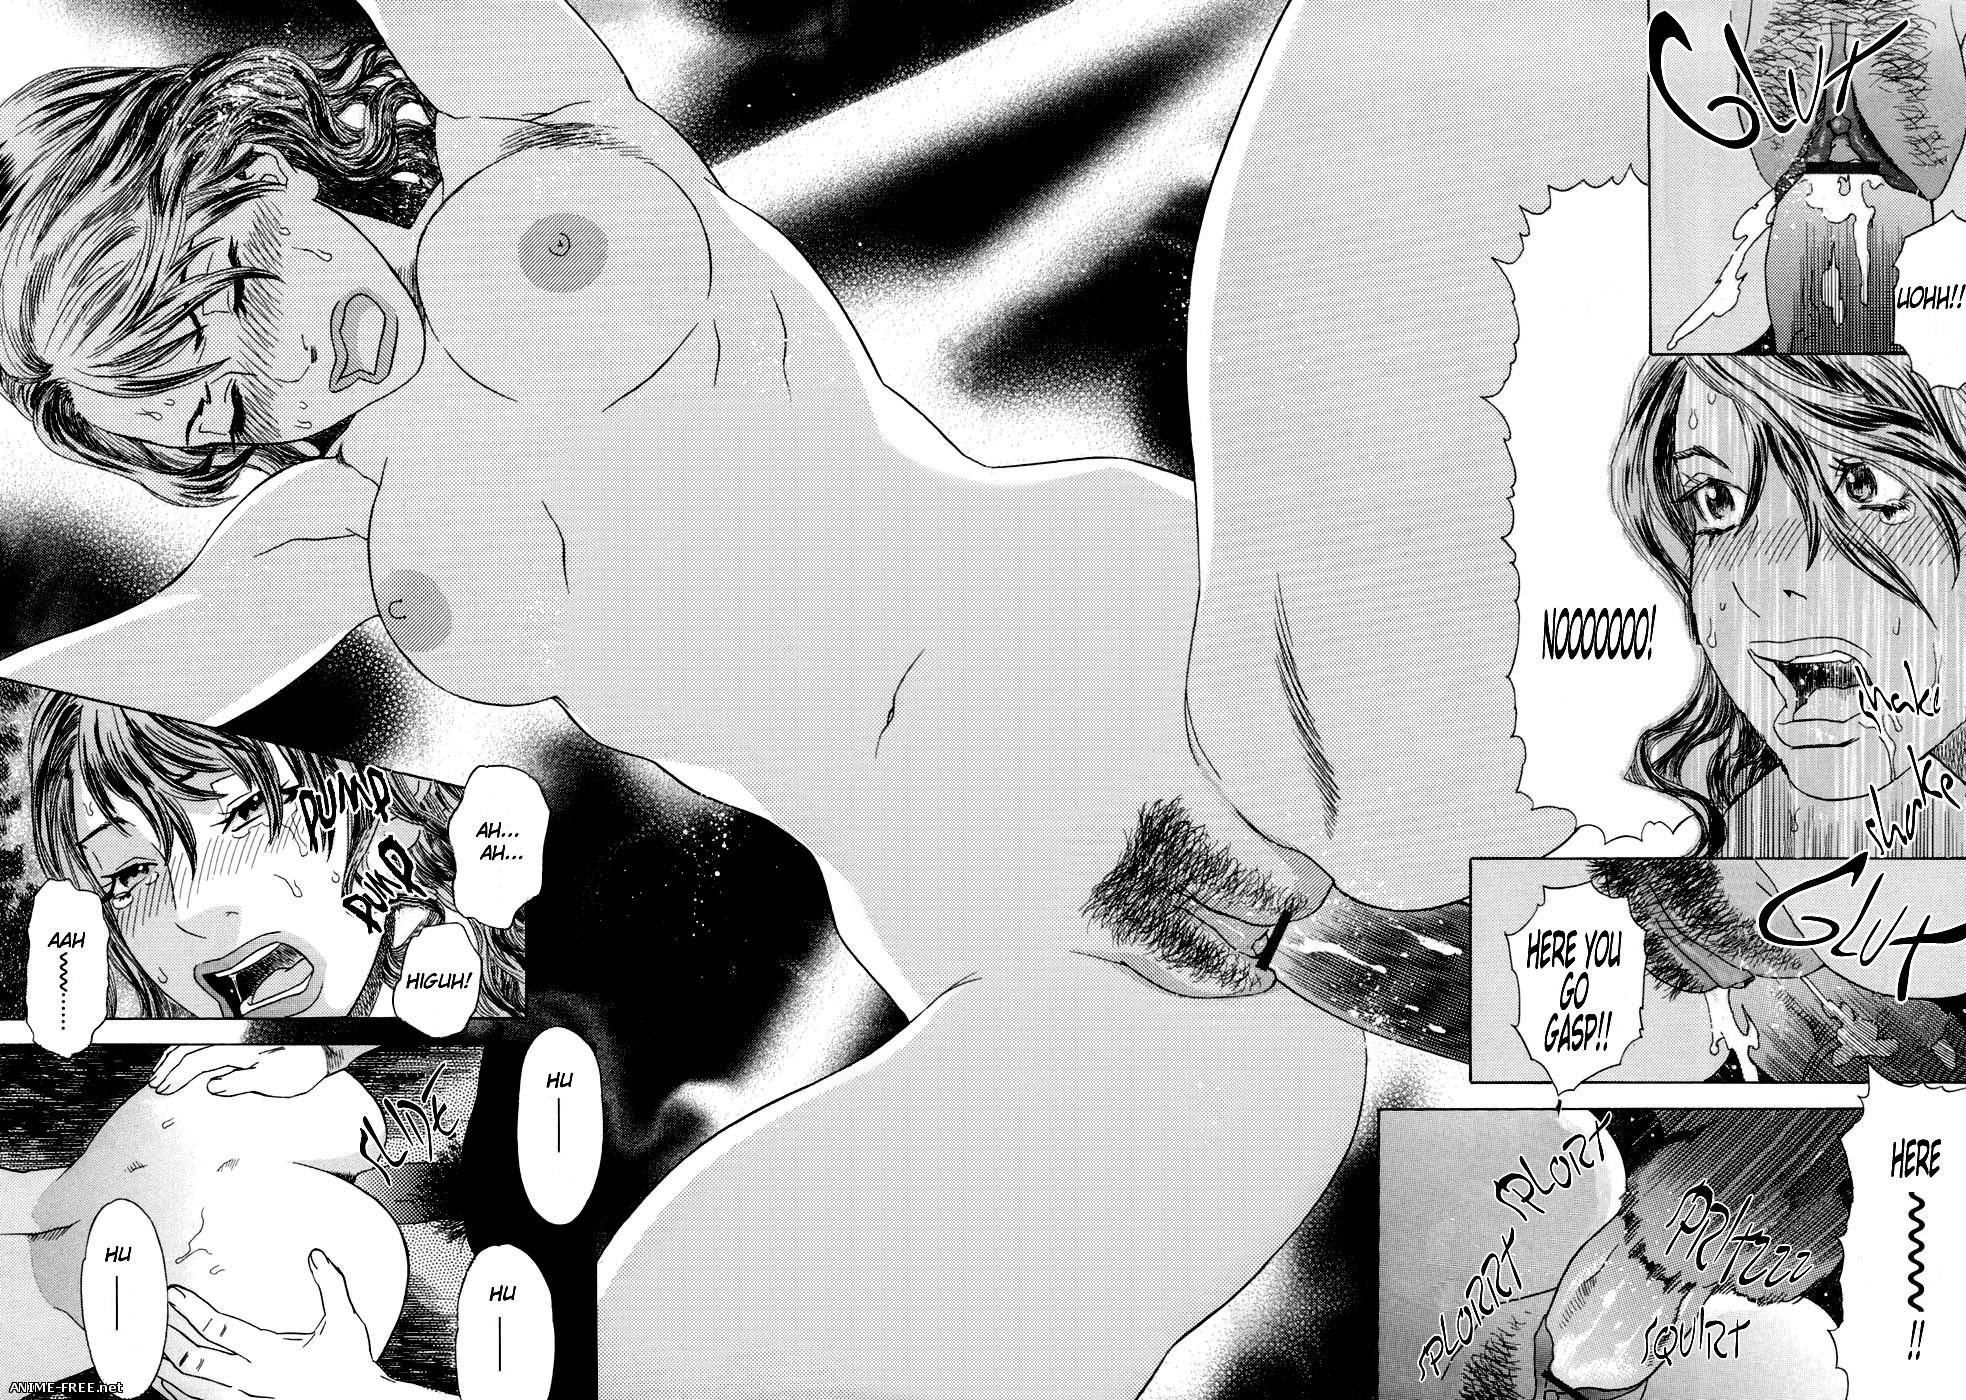 Tenjiku Rounin / DELIVERANCE (Collection) - Сборник хентай манги [Ptcen] [JAP,ENG,RUS] Manga Hentai